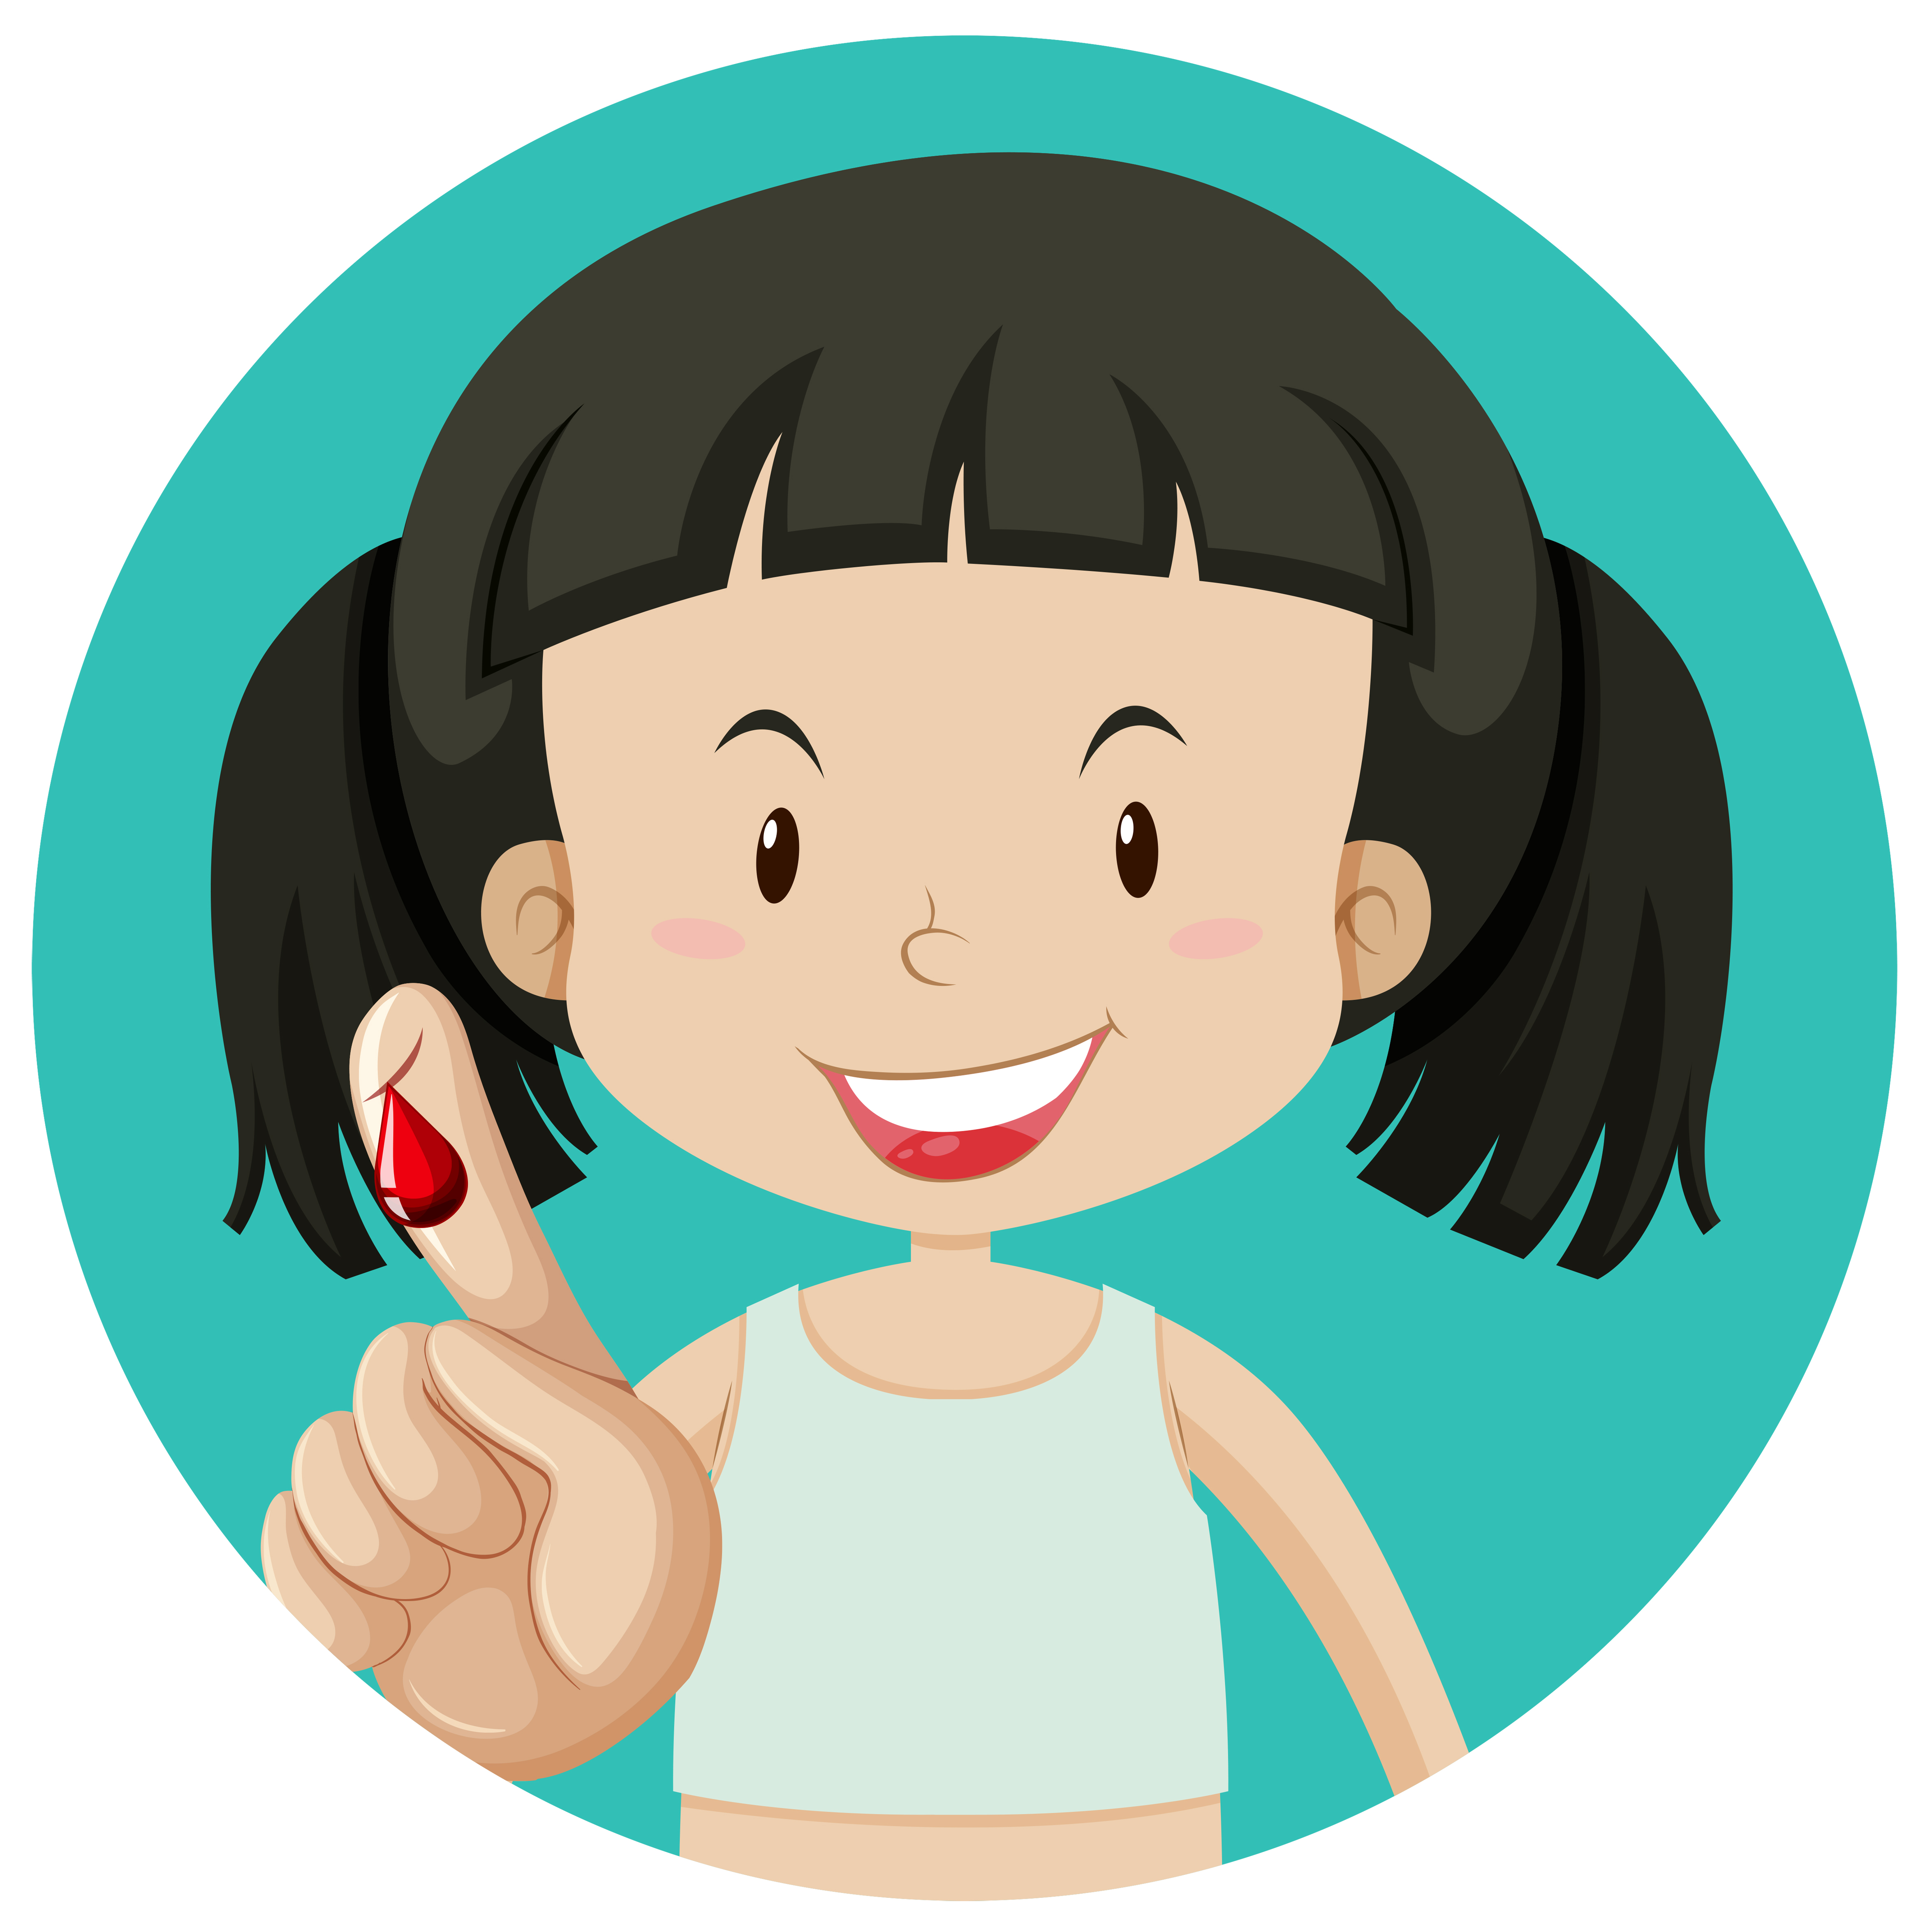 A Girl Bleeding On Finger Download Free Vectors Clipart Graphics Vector Art